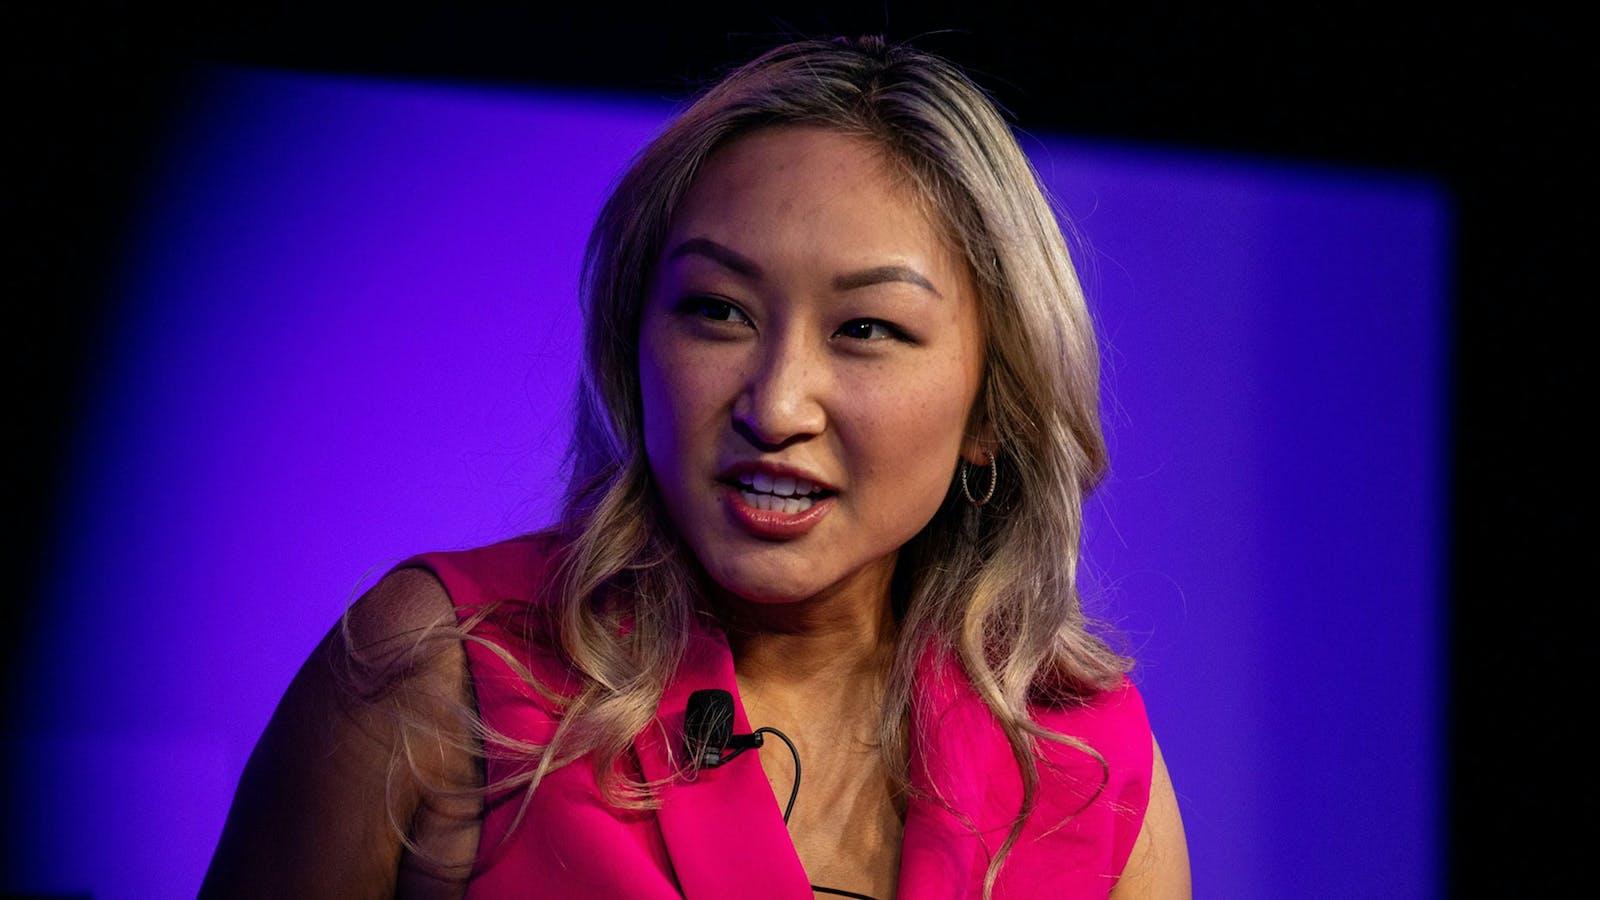 Sarah Guo, a general partner at Greylock Partners. Photo by Bloomberg.